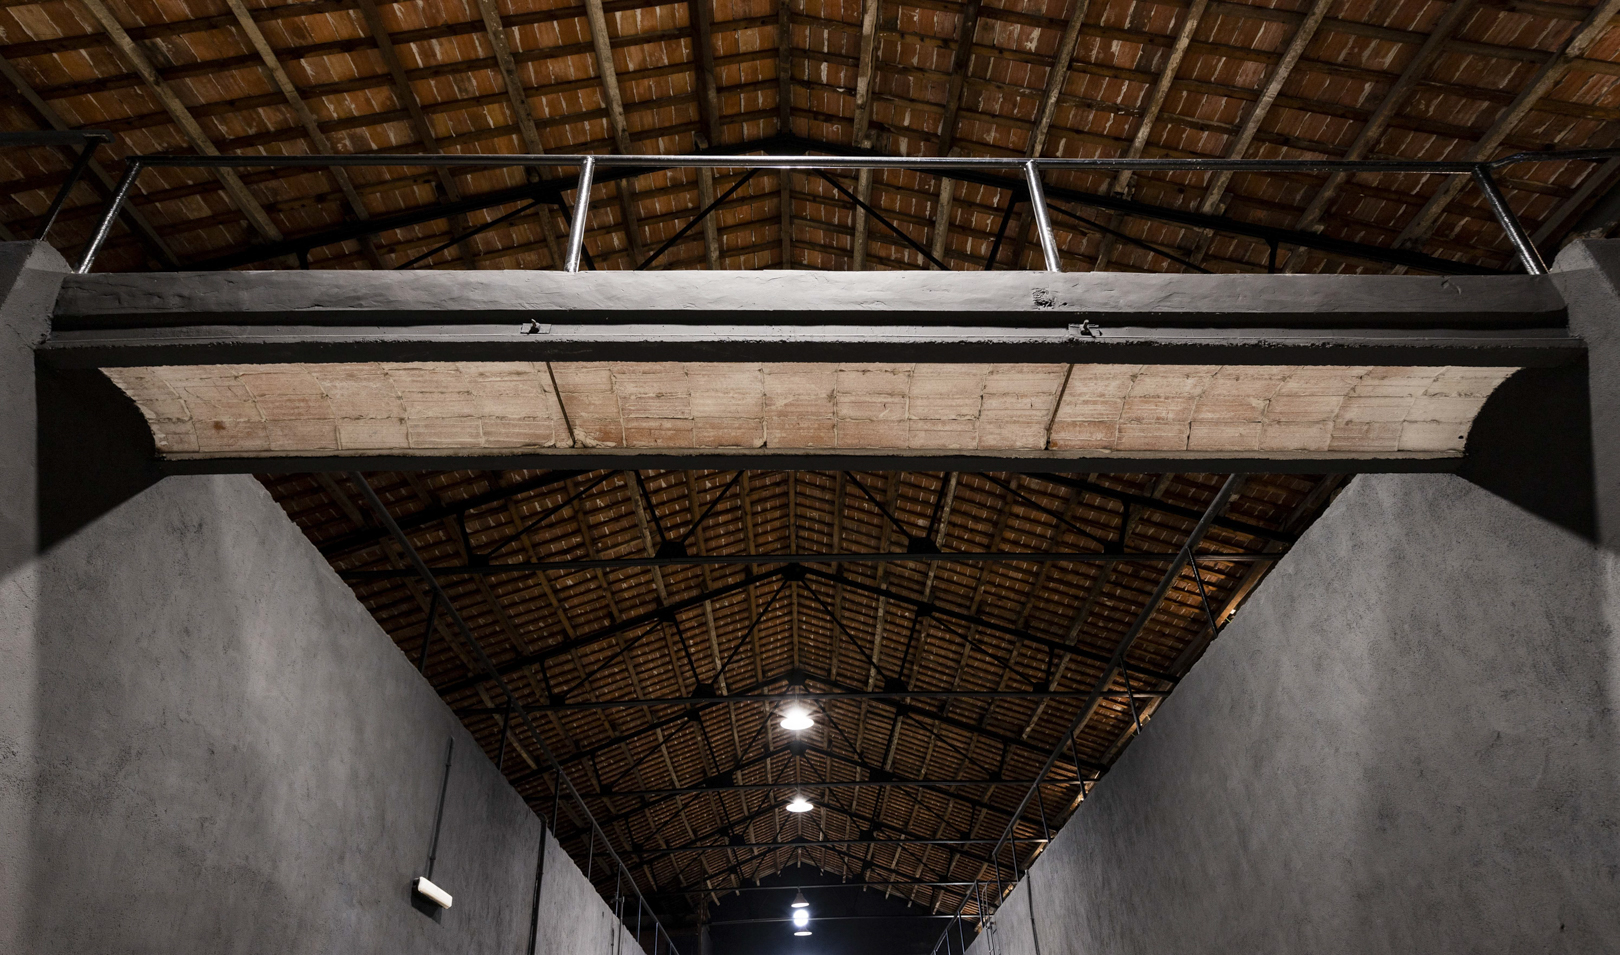 Fotografias de arquitectura Felguera Fotografo